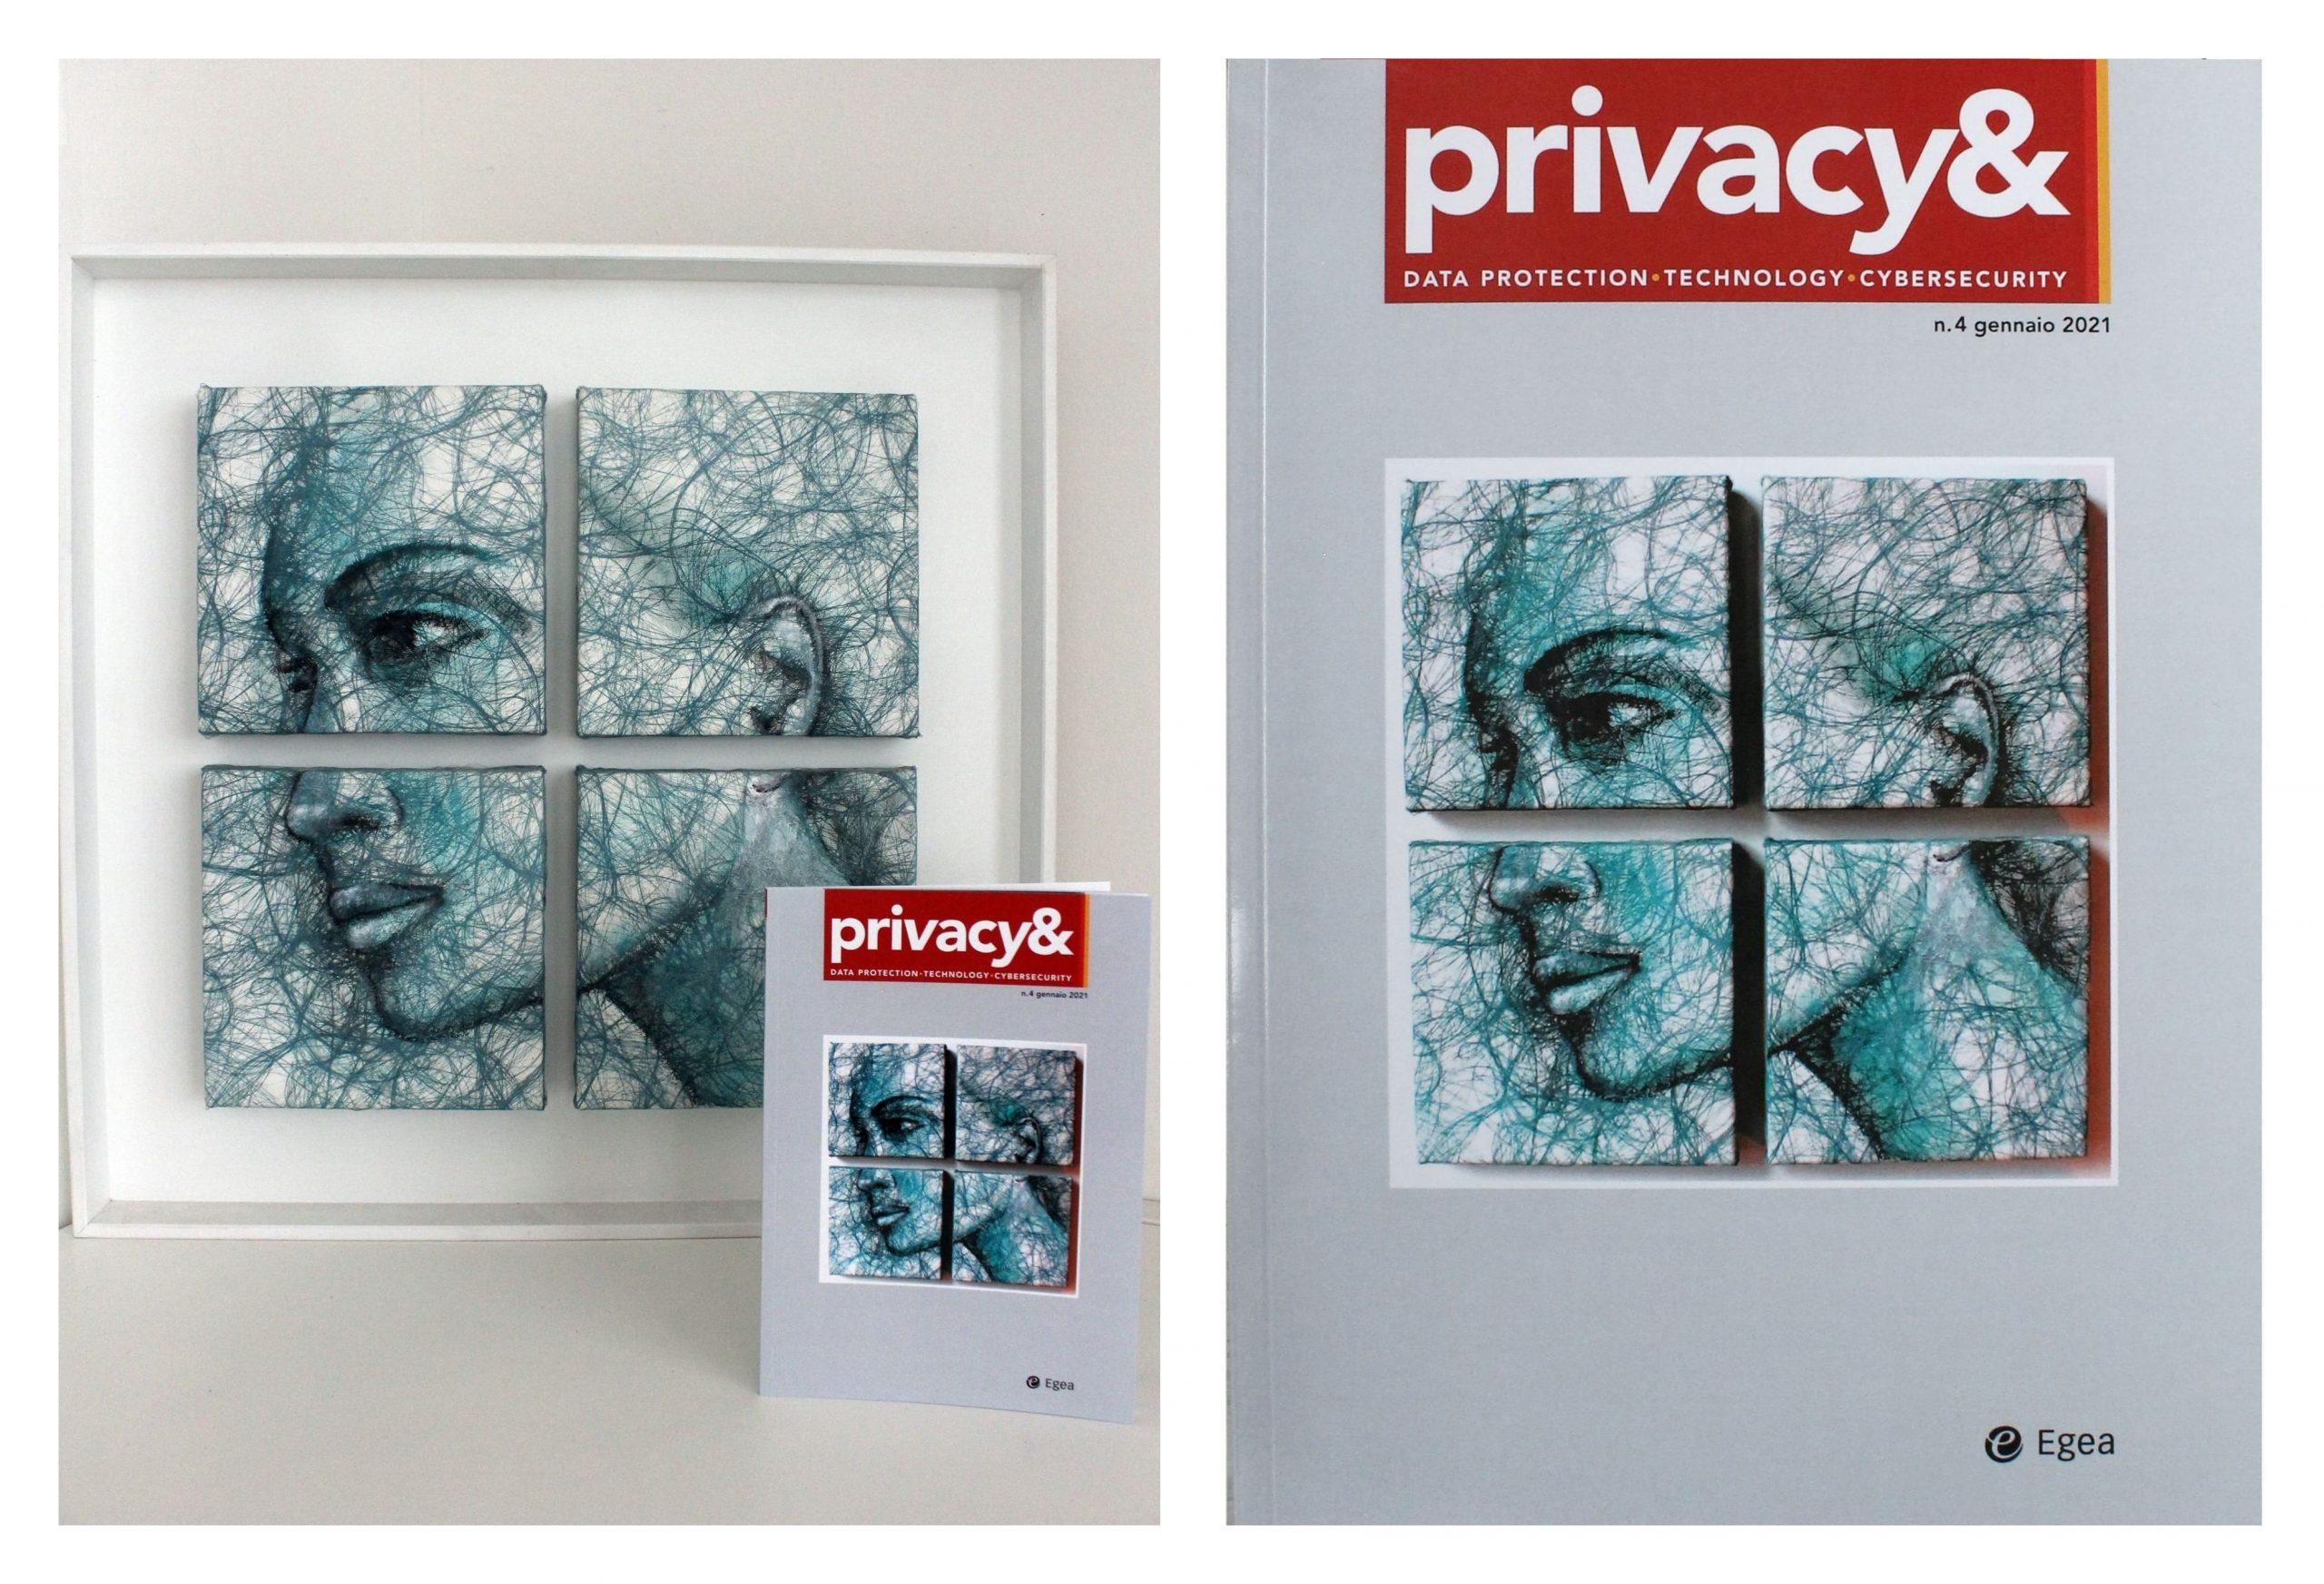 Roberta Zambon,Privacy&,Egea,Bocconi,Milan,Cover,Paint,italianart